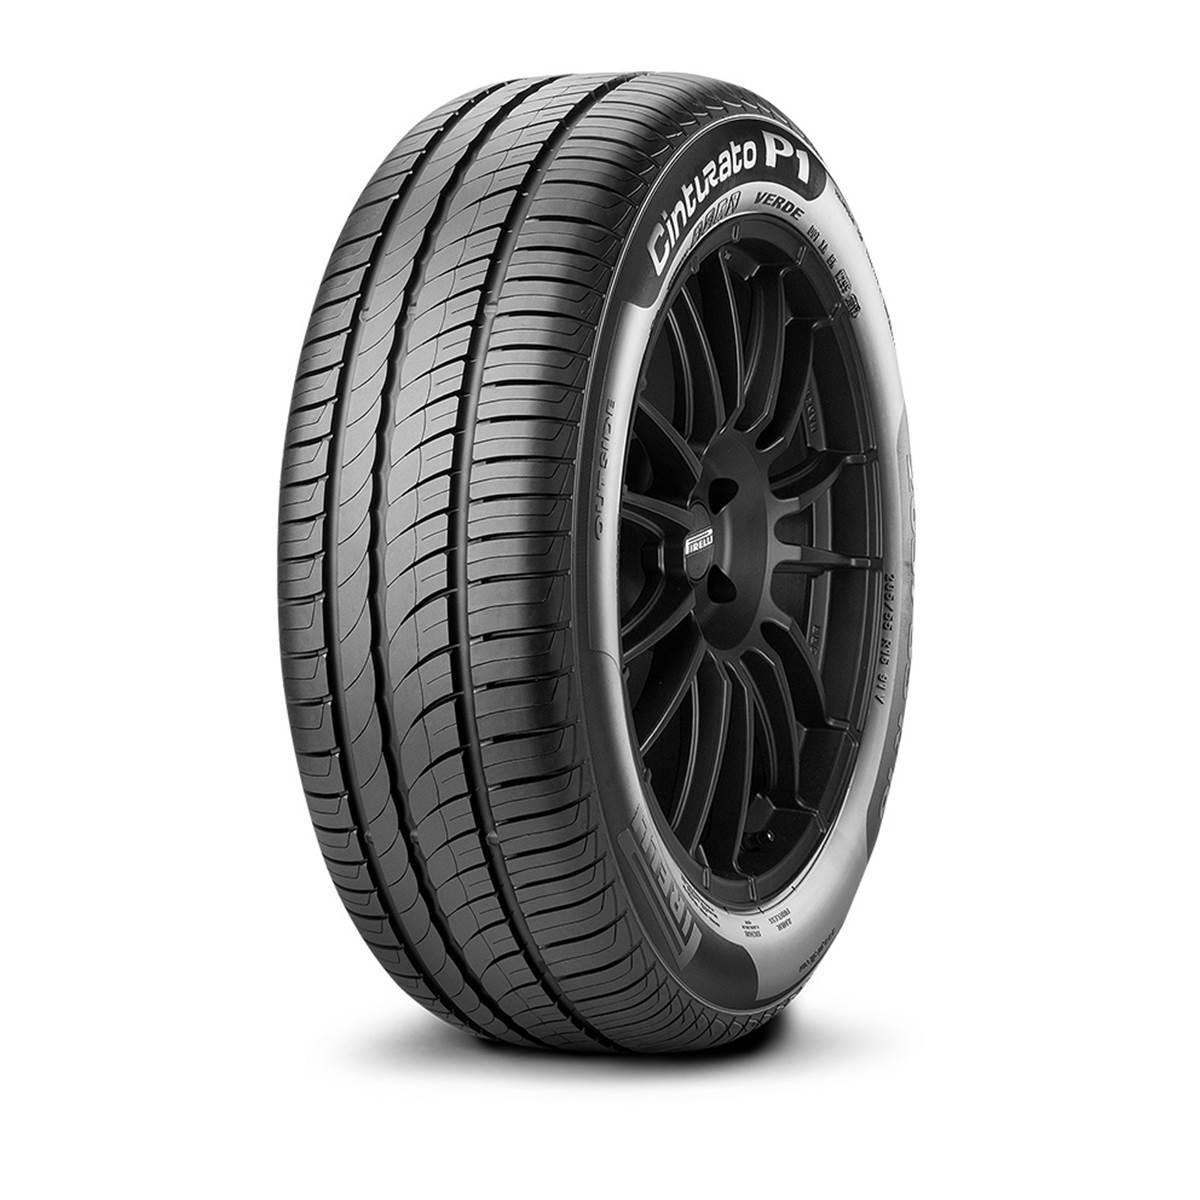 Pneu Pirelli 225/50R17 98V Cinturato P1 XL